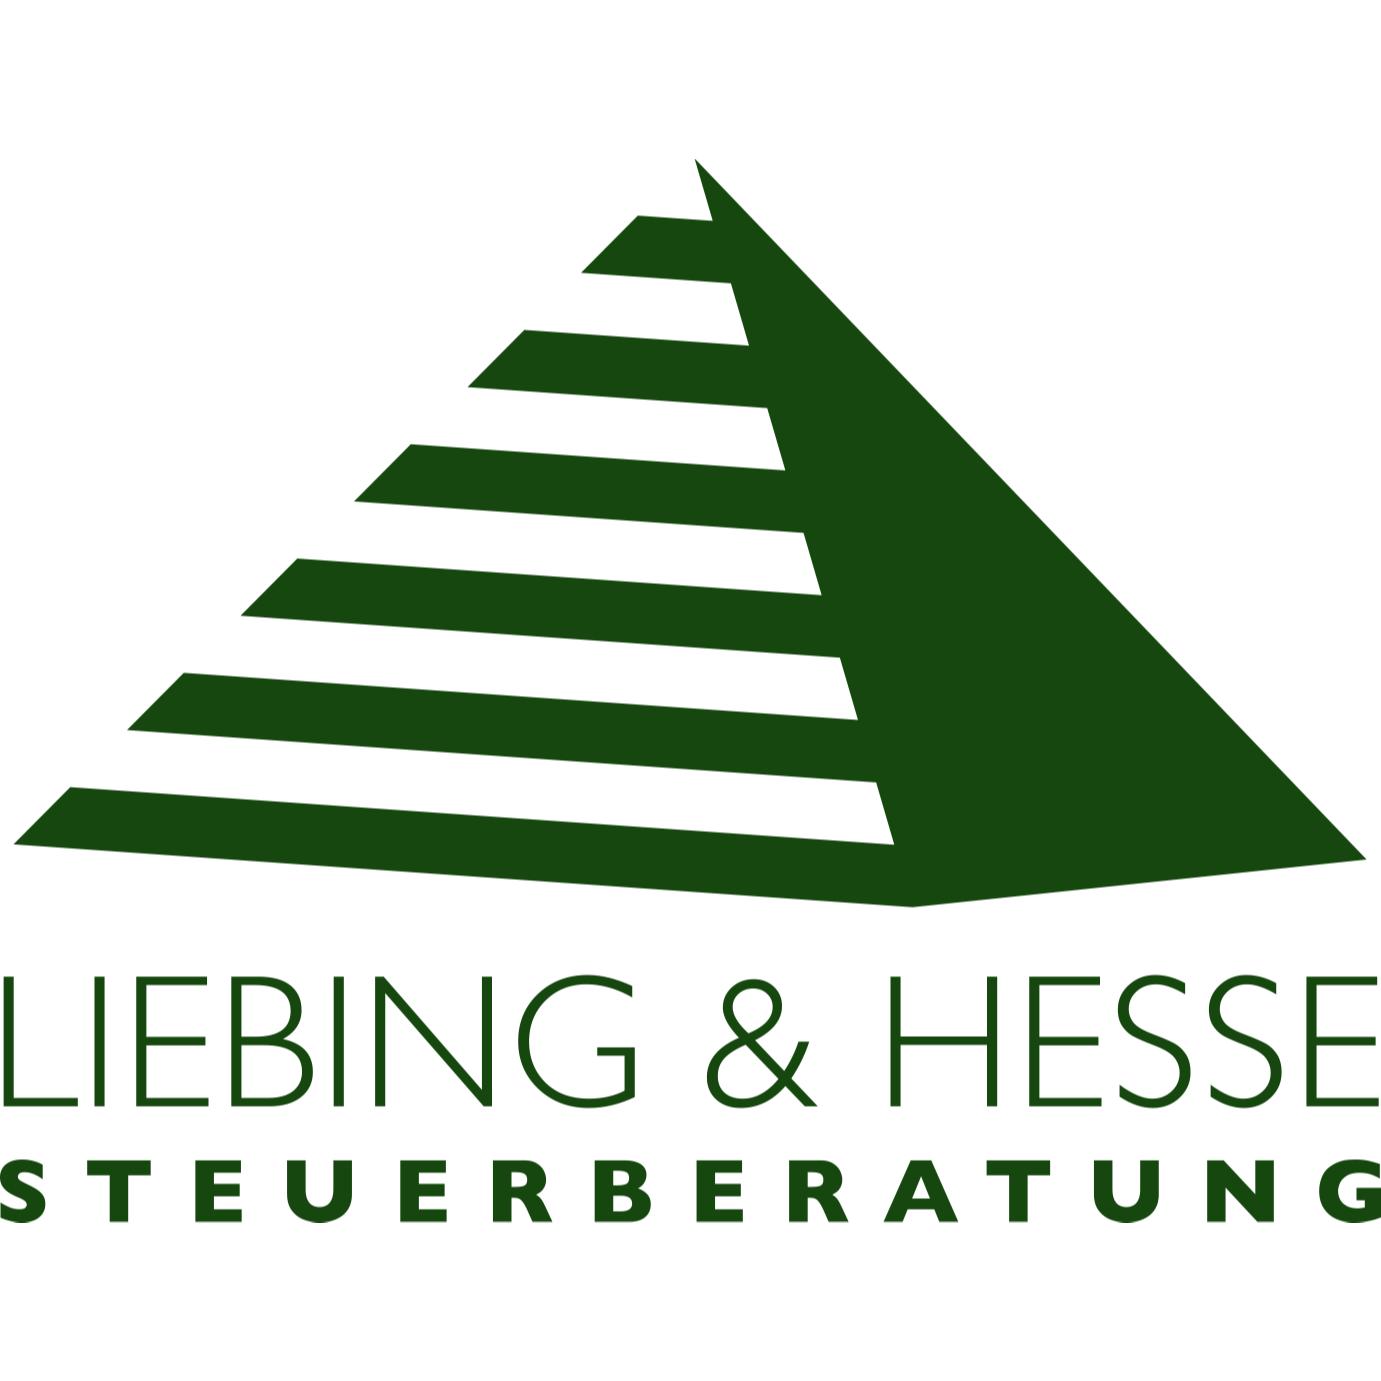 Liebing & Hesse Steuerberatung